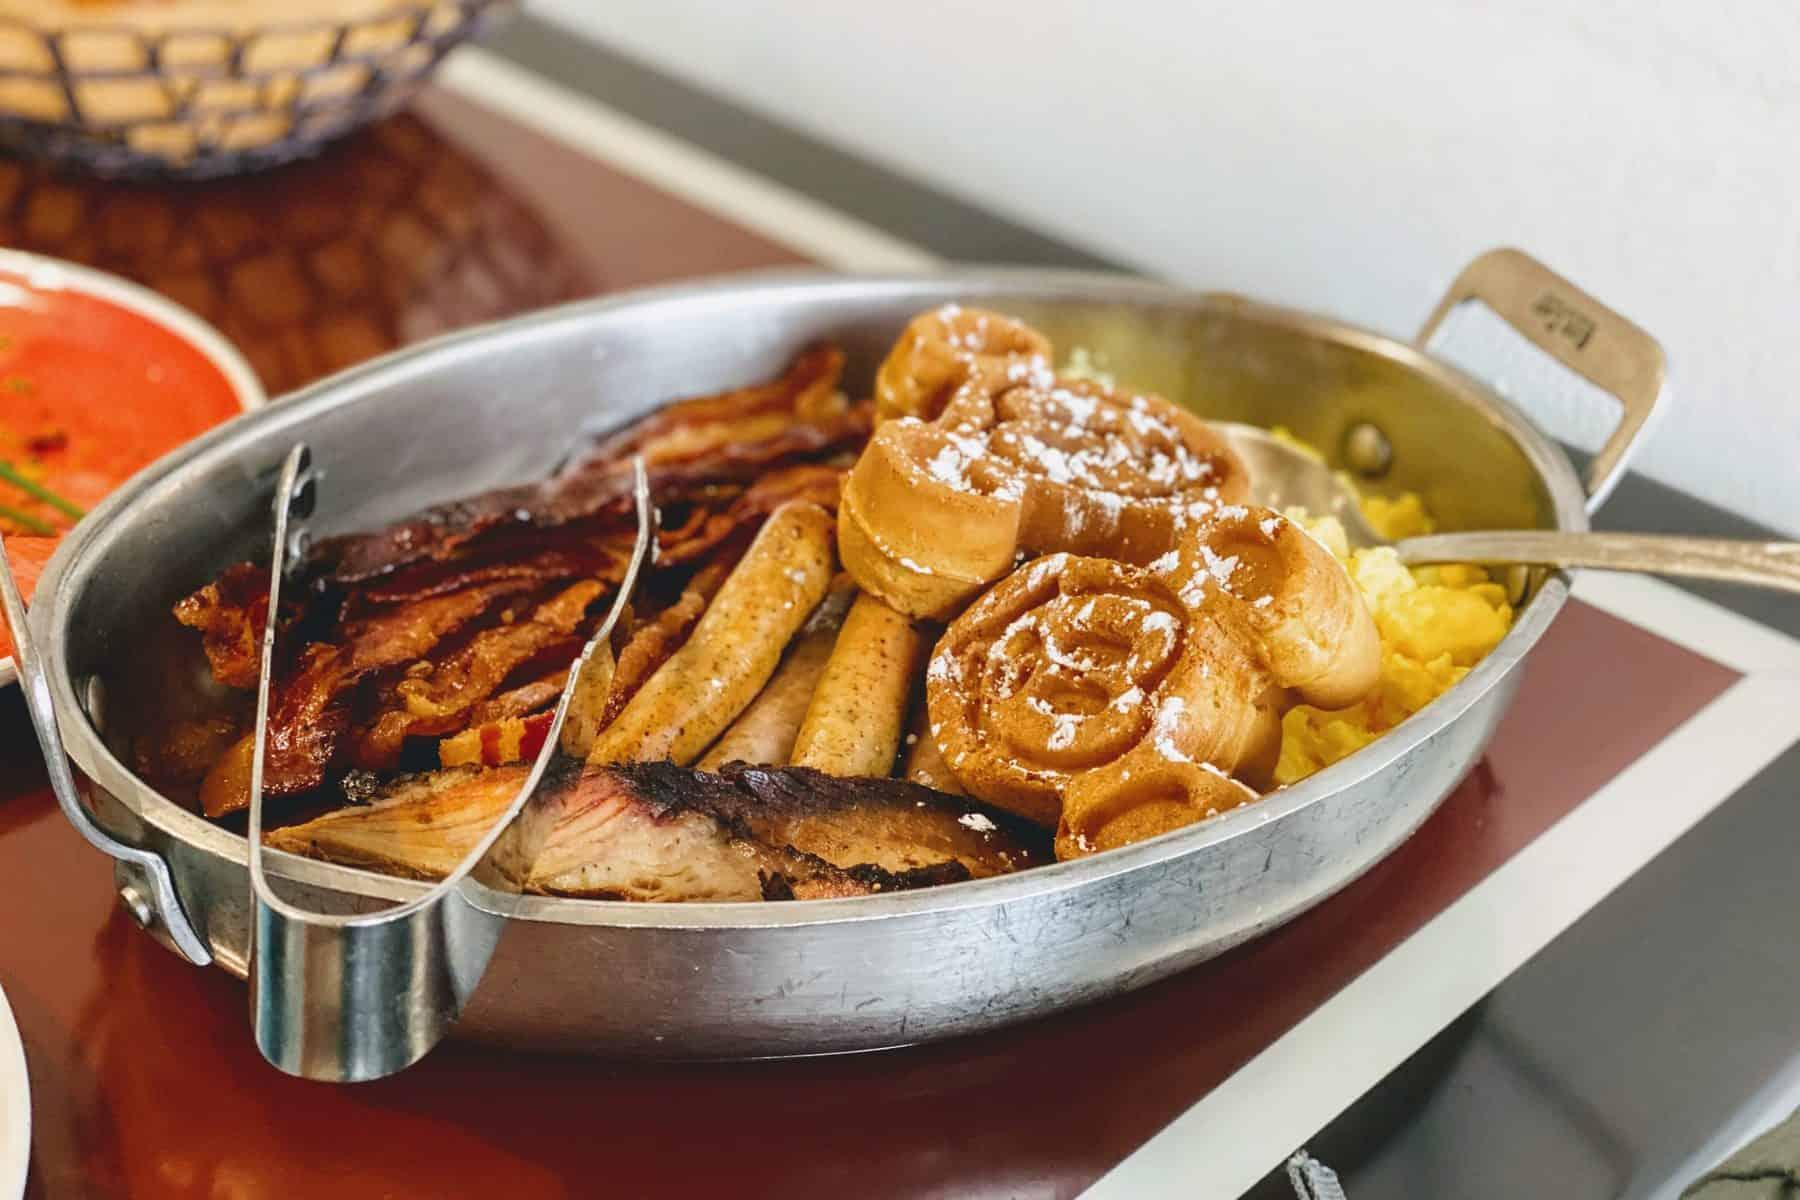 Platter of breakfast food